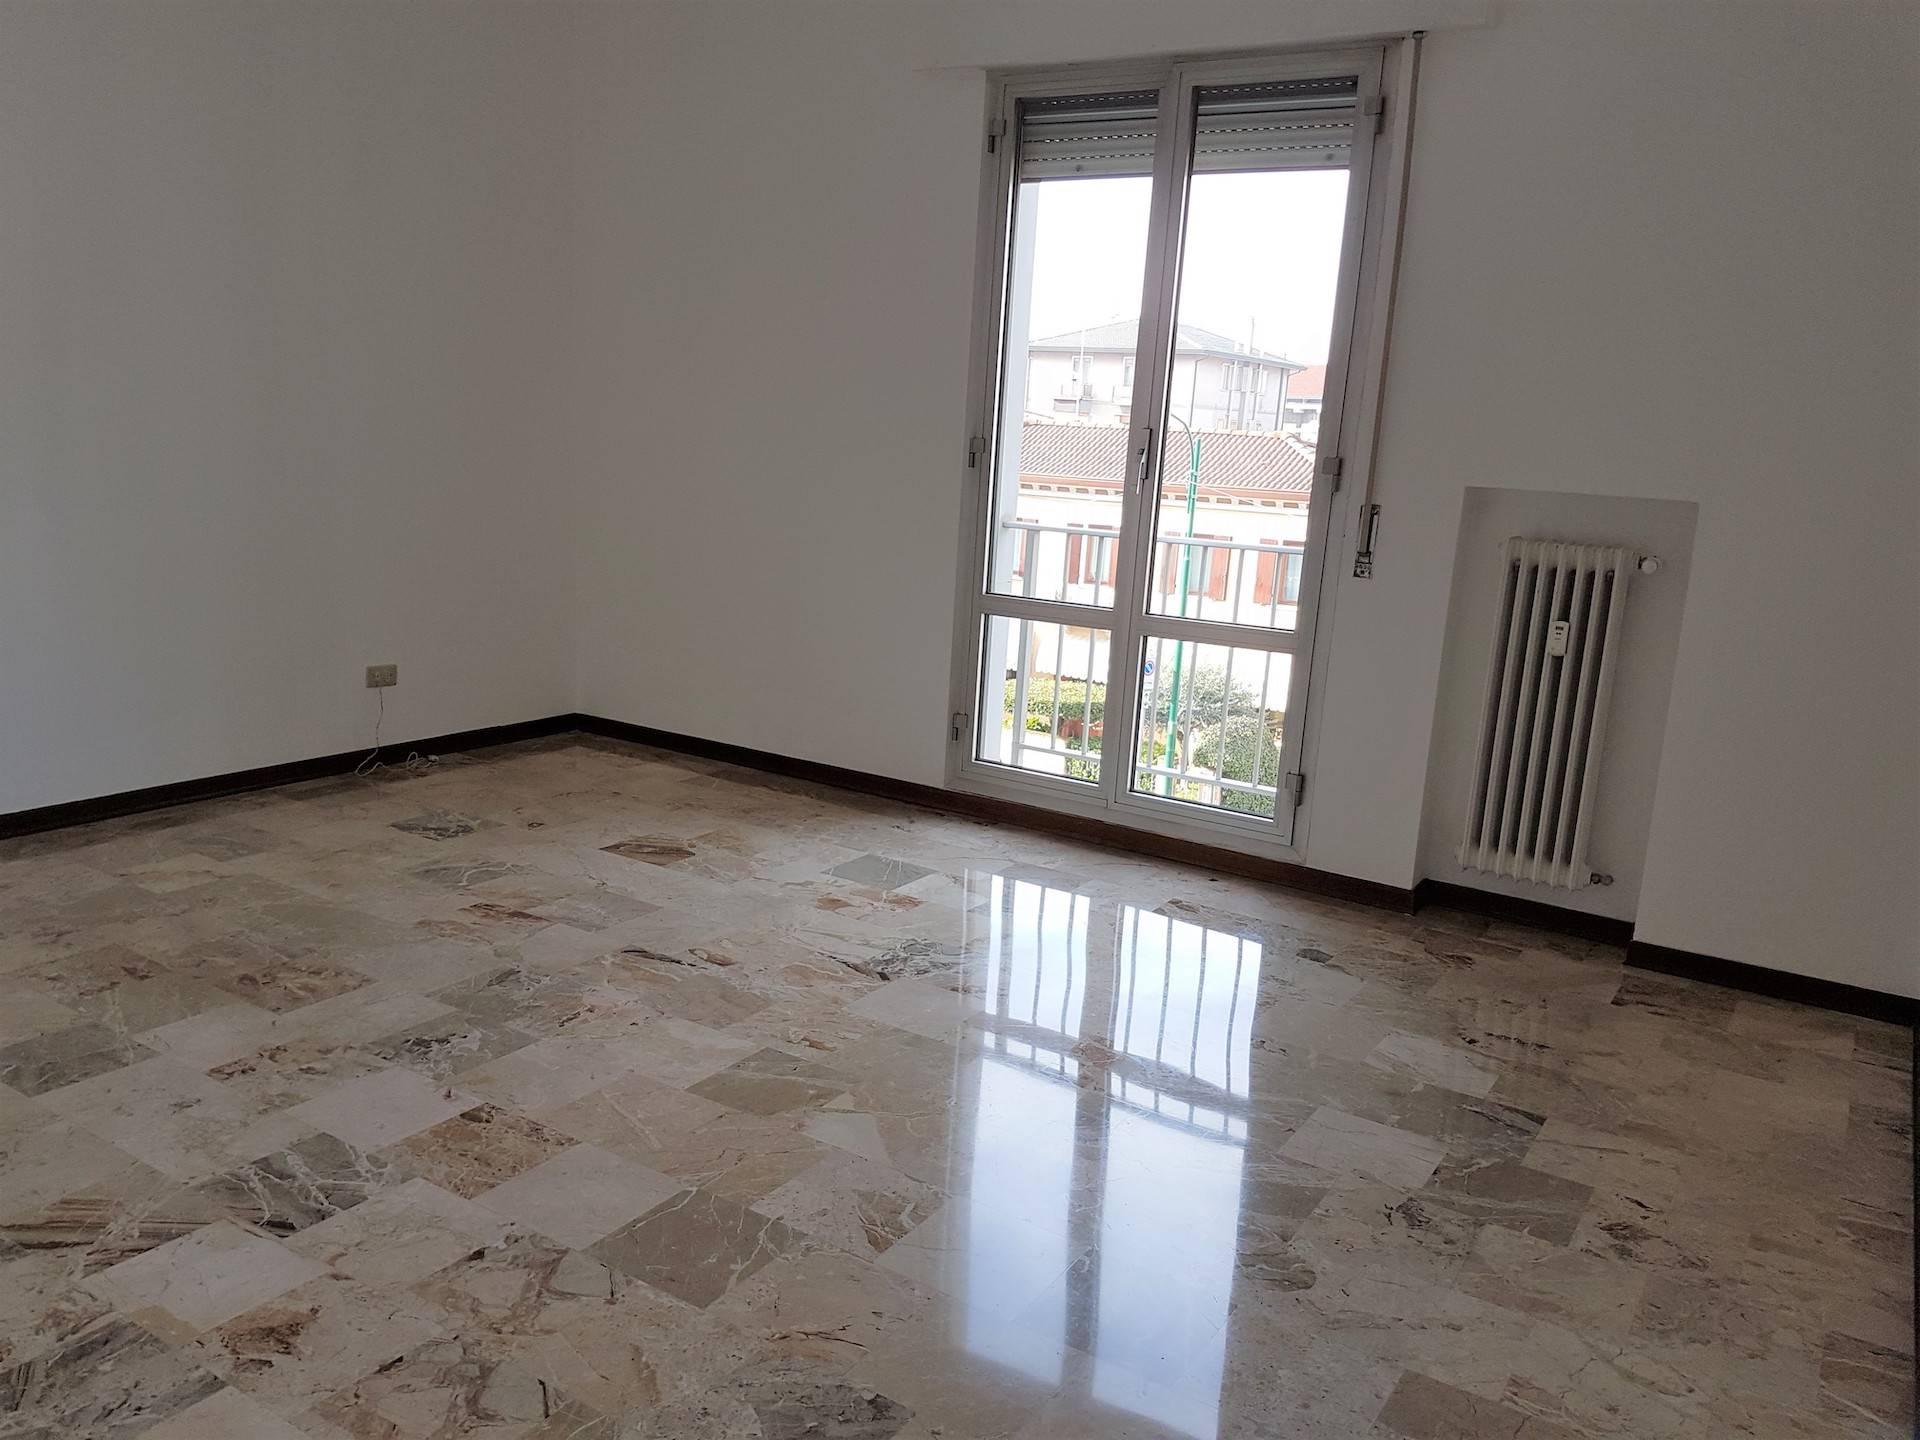 camera appartamento Mestre Campalto vendita